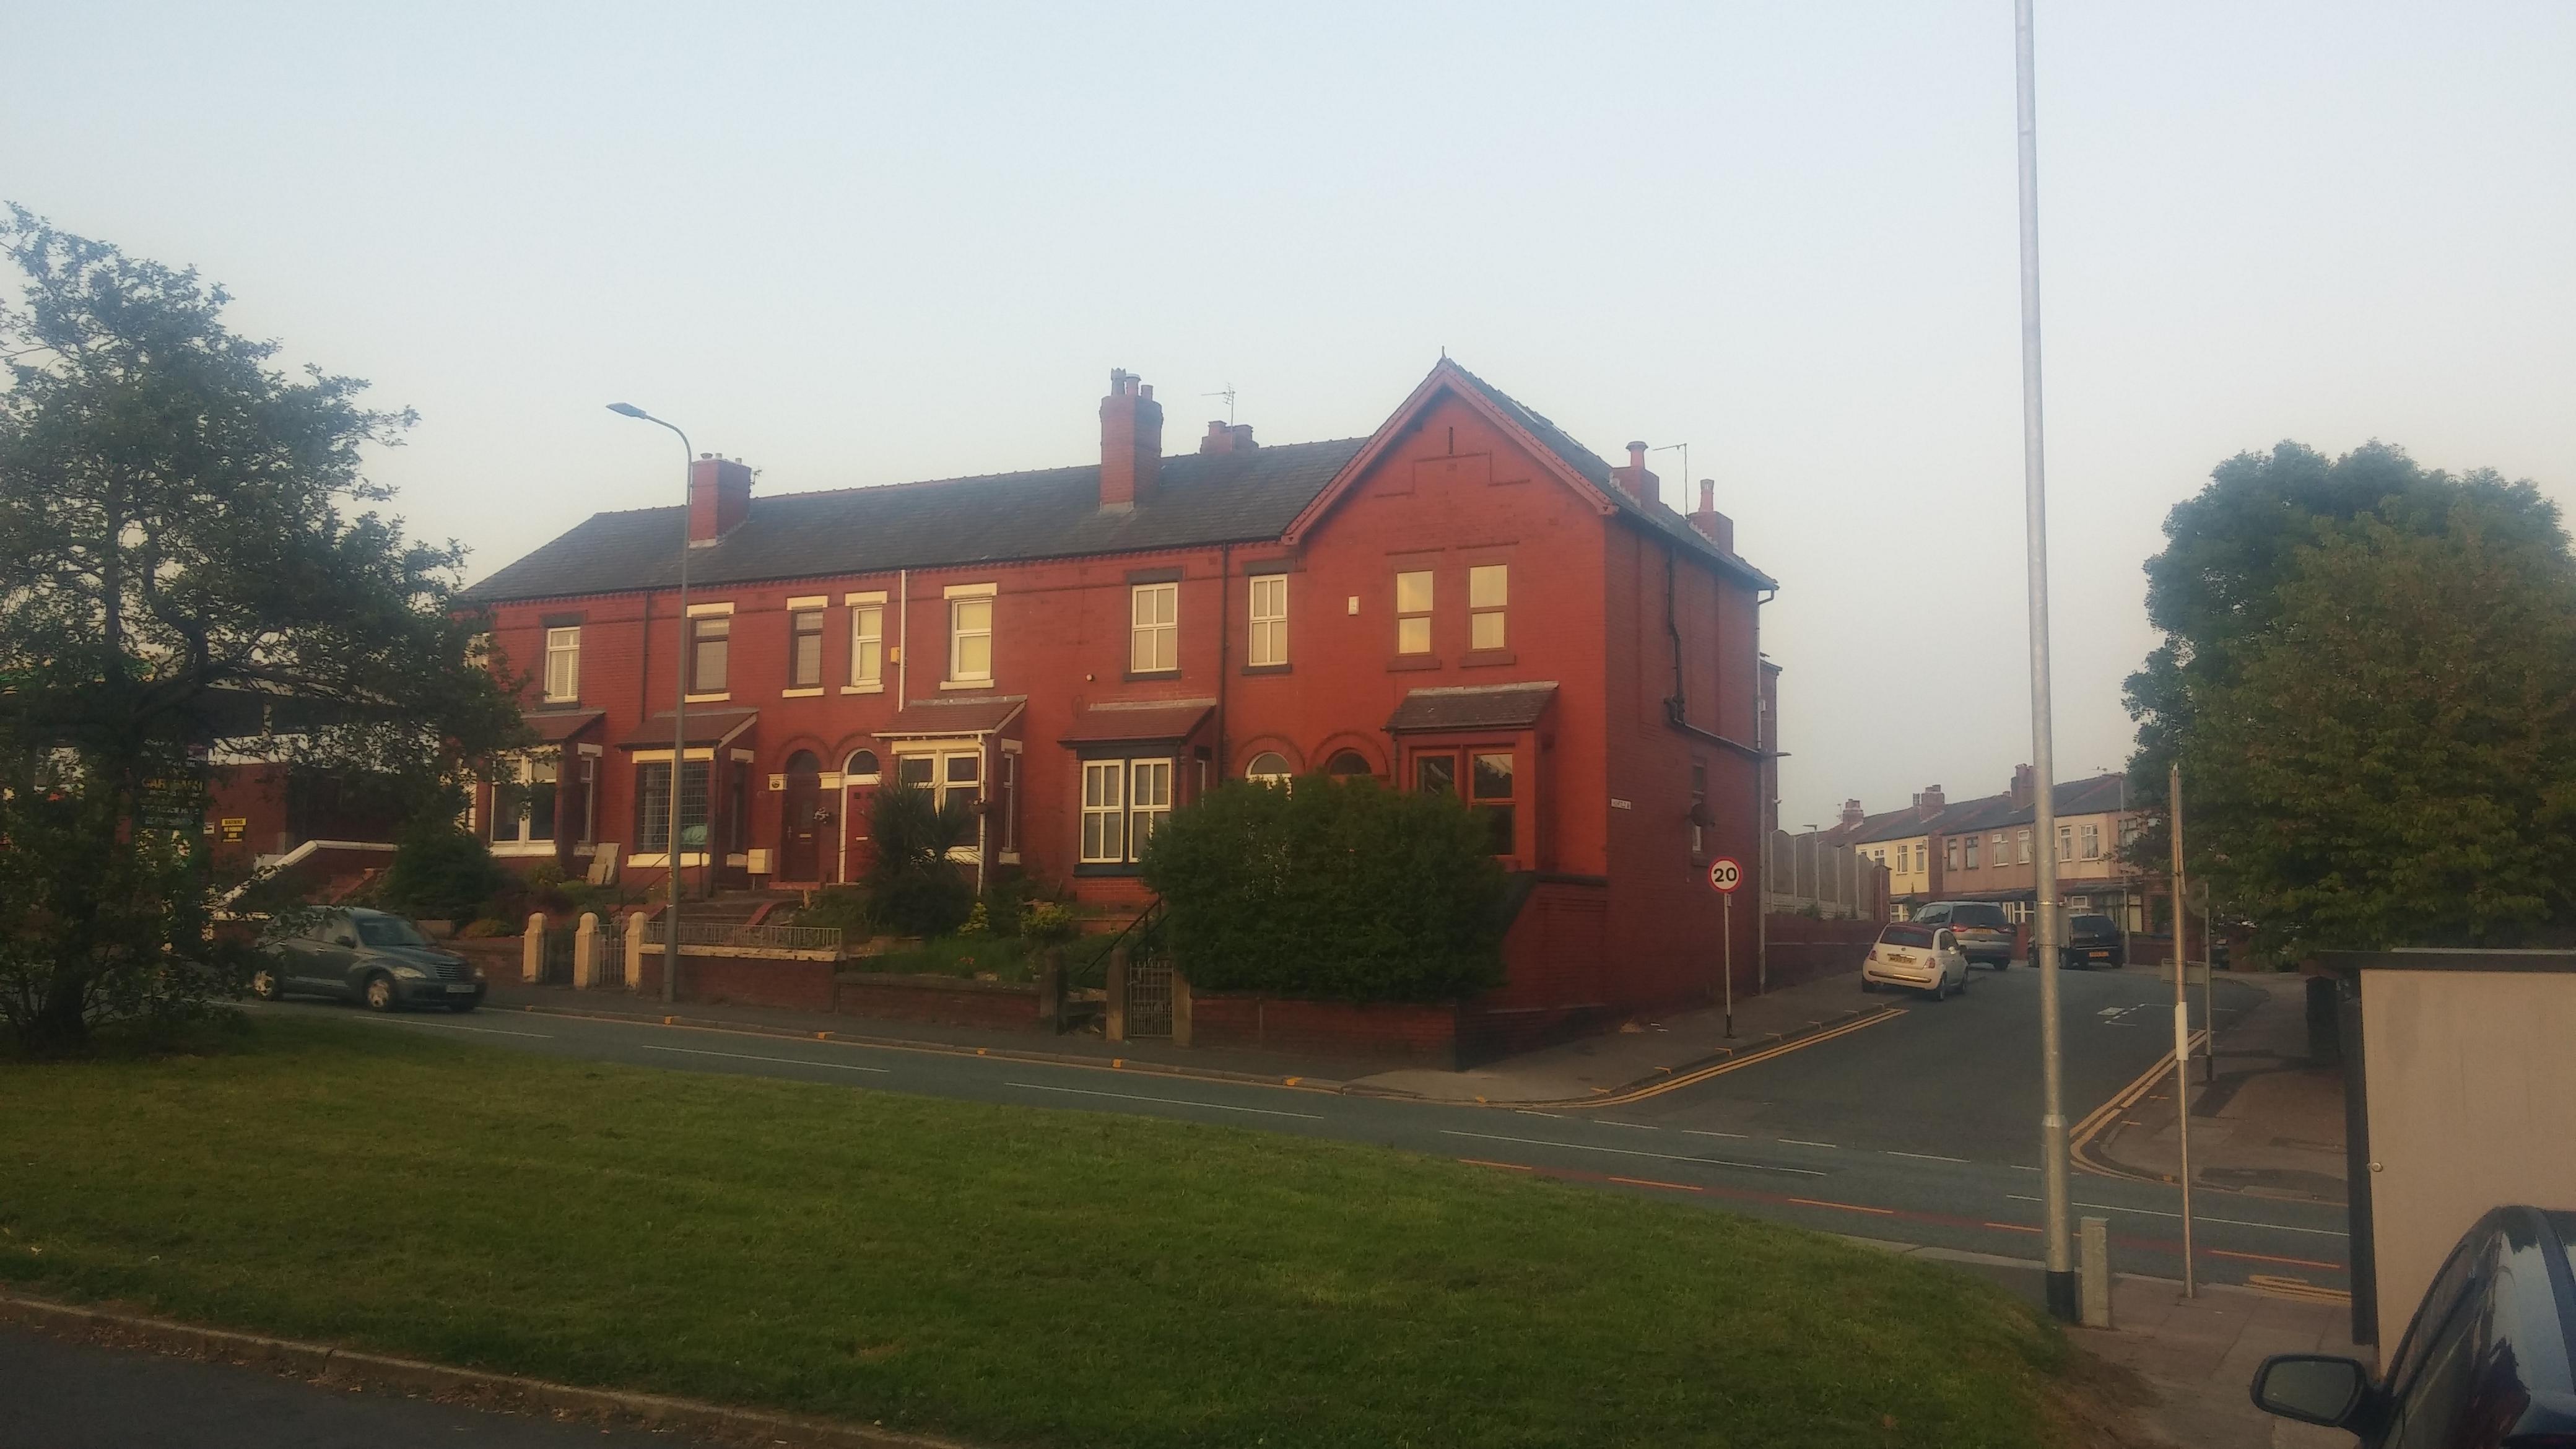 Whelley, Wigan, UK